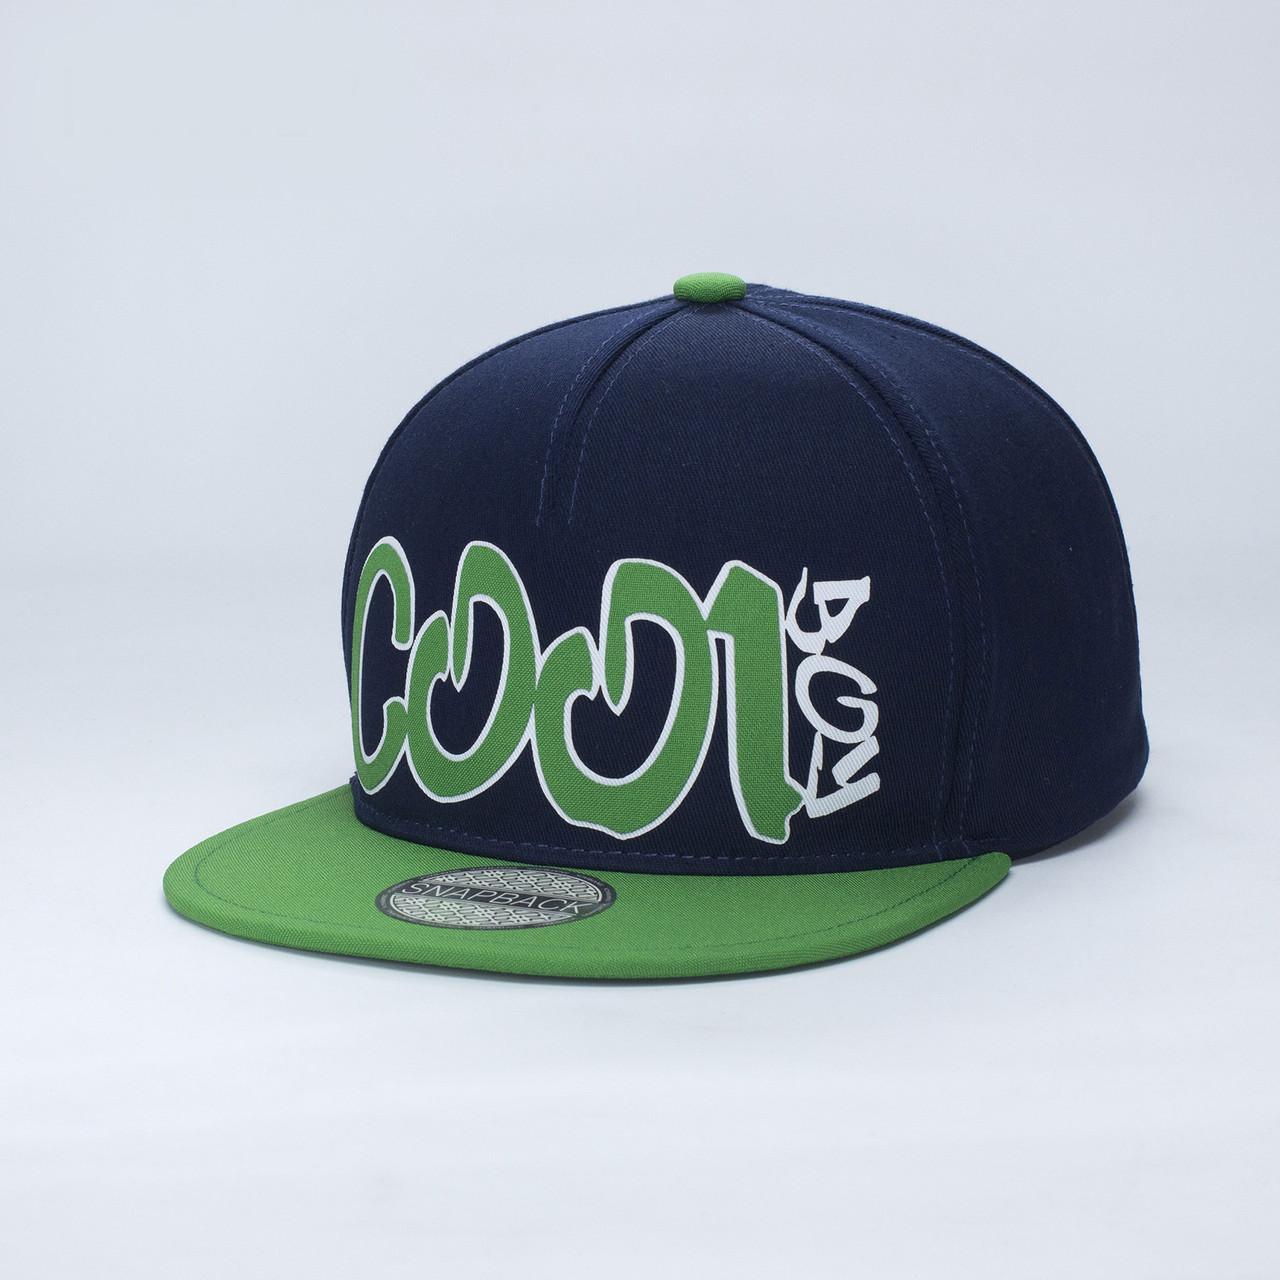 Бейсболка для мальчика INAL cool boy XS / 51-52 RU Синий 96751